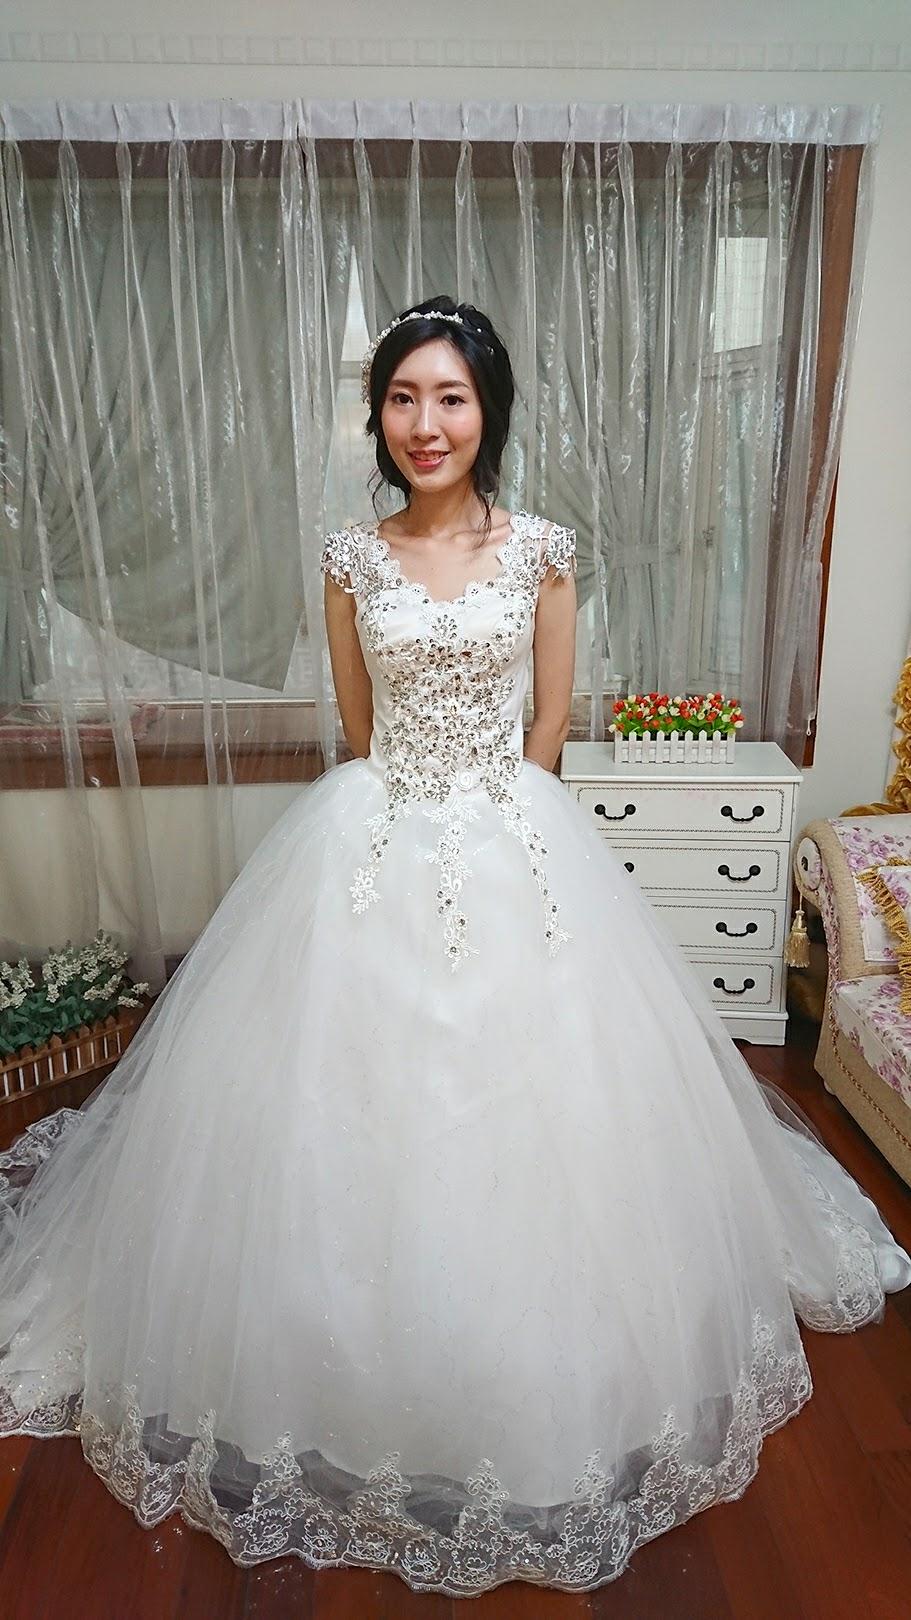 DSC_0309_mh1502177720836 - 花精靈婚紗∣攝影∣新秘 - 結婚吧